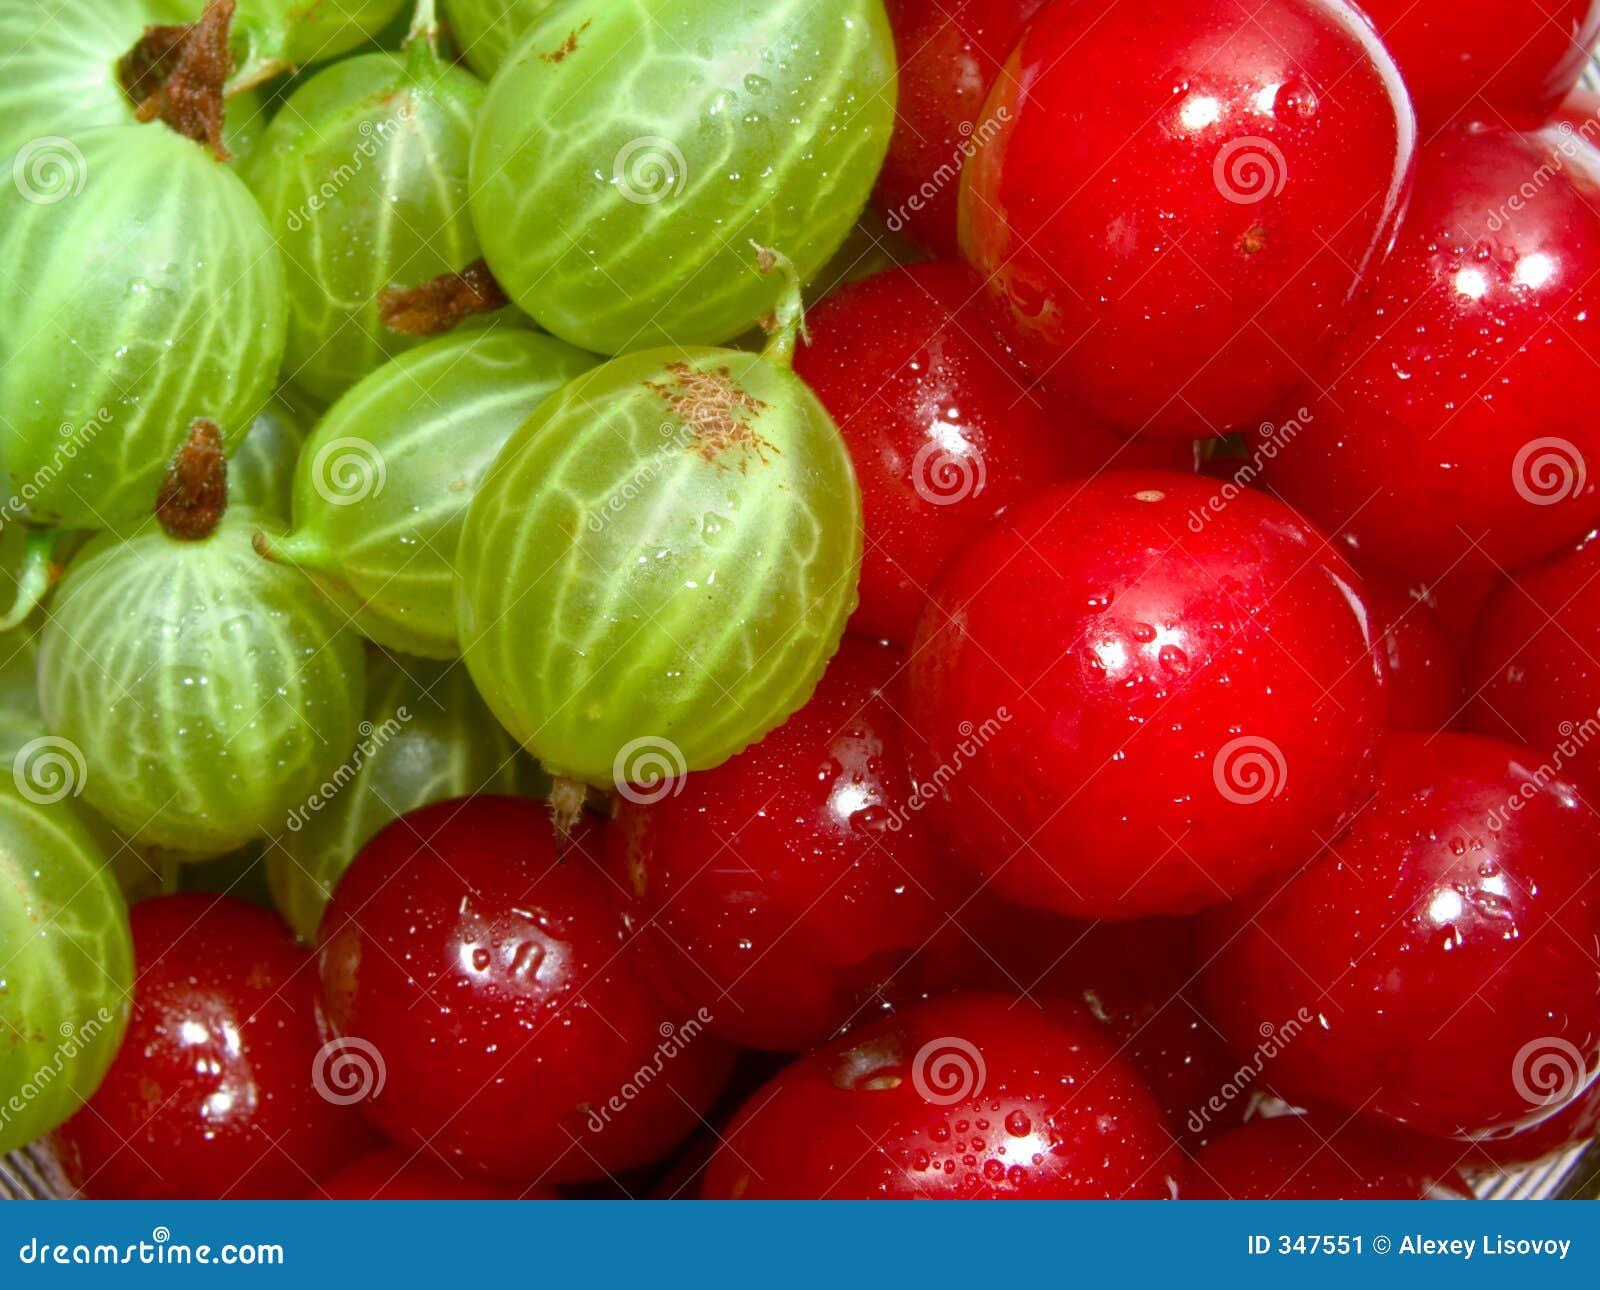 Cherries and gooseberries 1